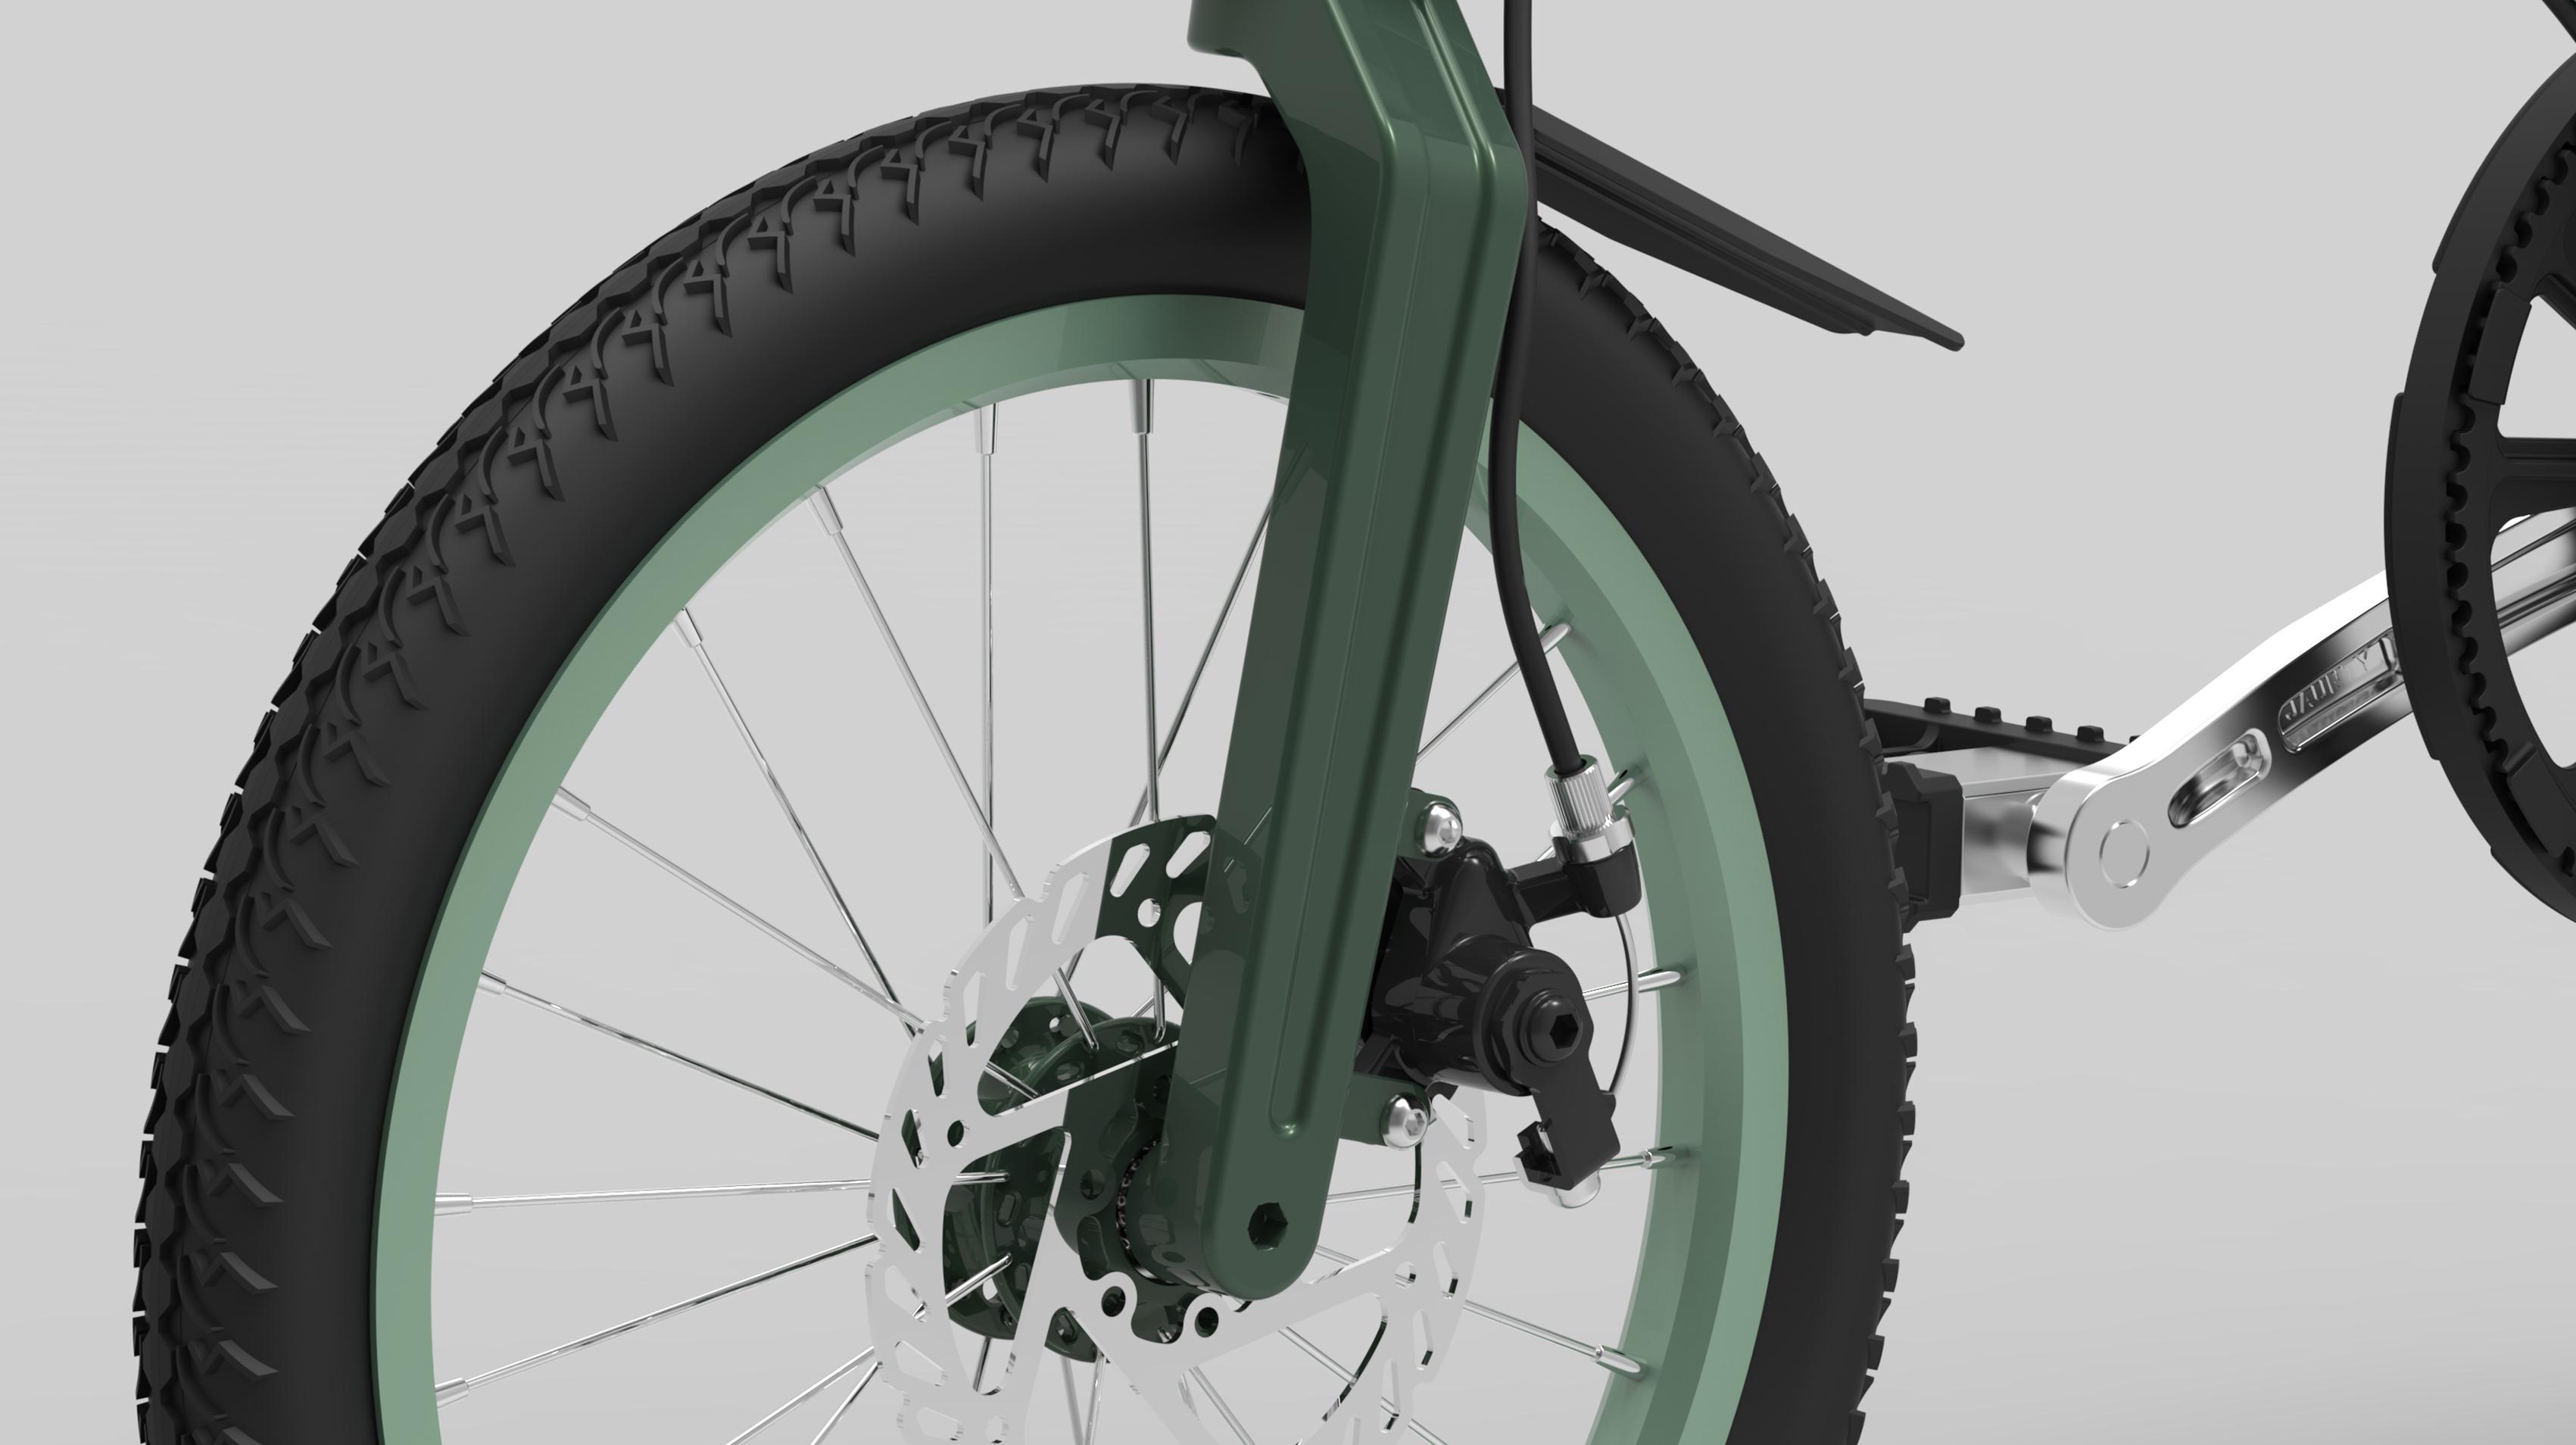 Smallest Folding Bike Lightest Weight Folding Bike